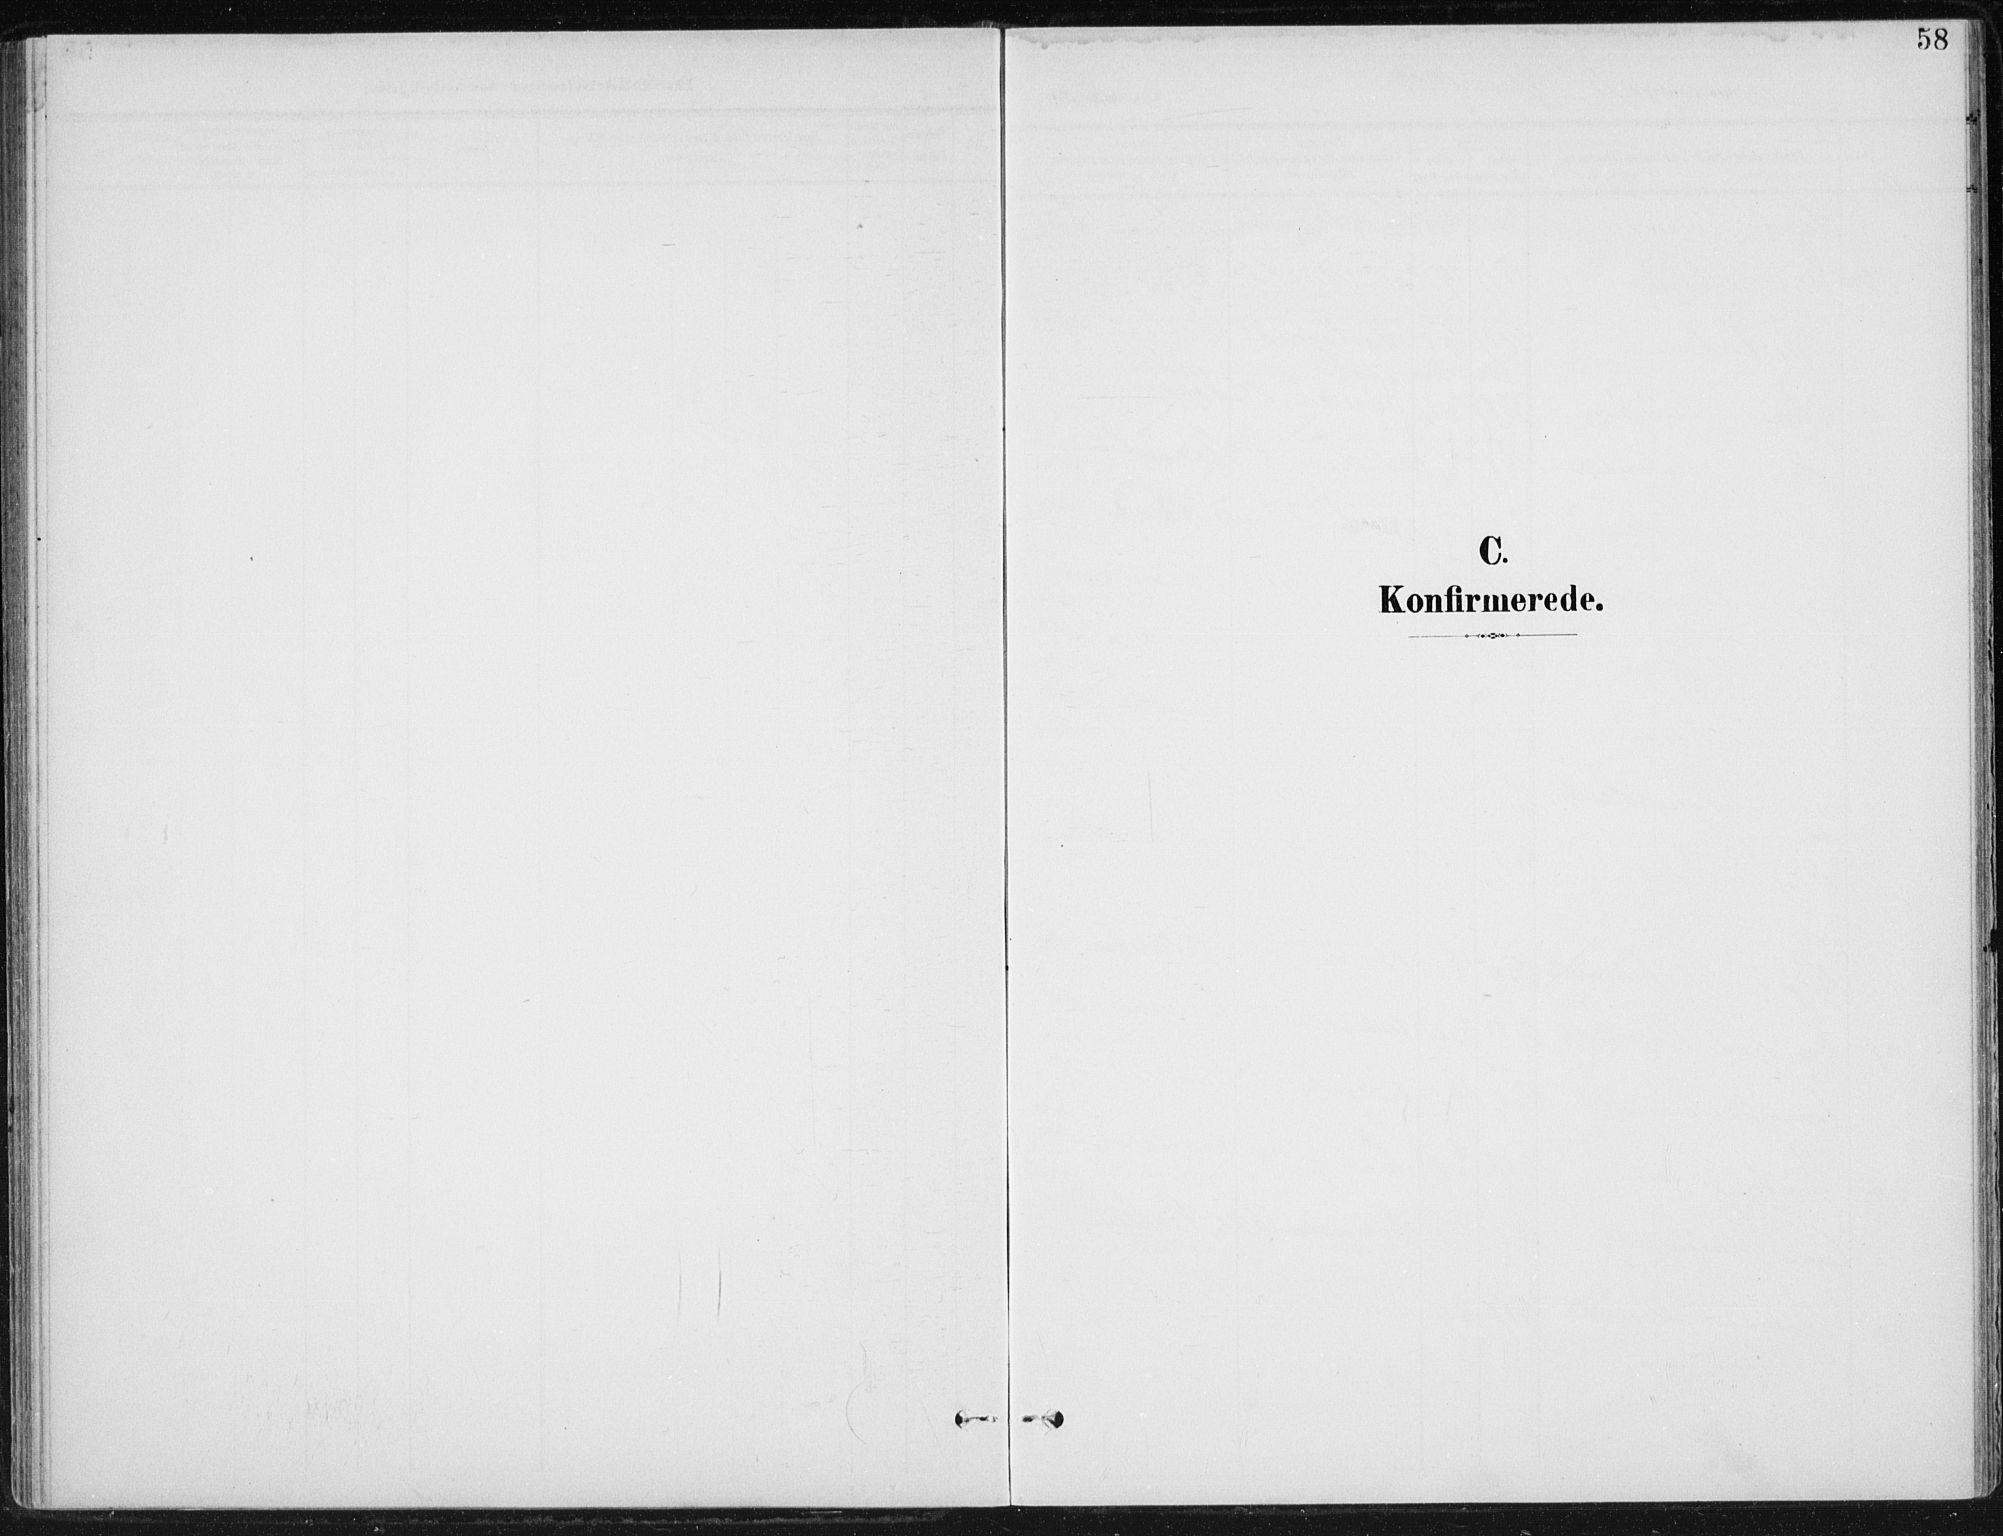 SAH, Østre Gausdal prestekontor, Ministerialbok nr. 5, 1902-1920, s. 58